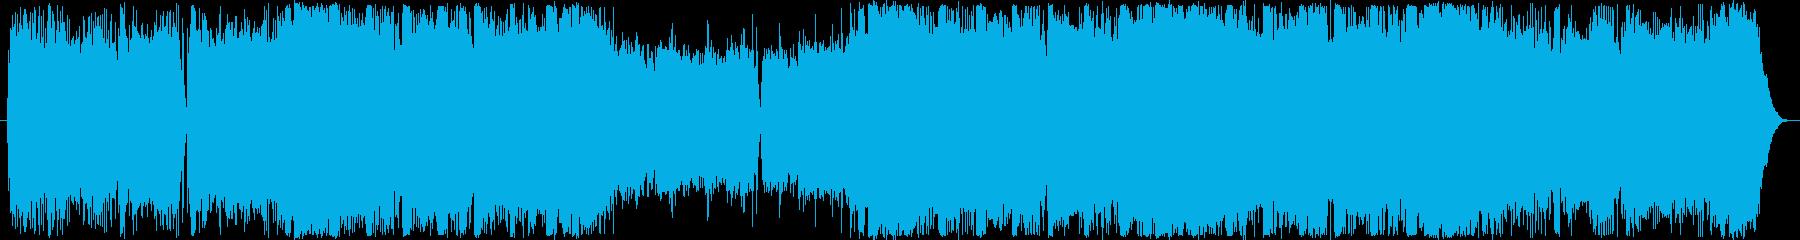 CM・おしゃれな洋楽フューチャーベースの再生済みの波形